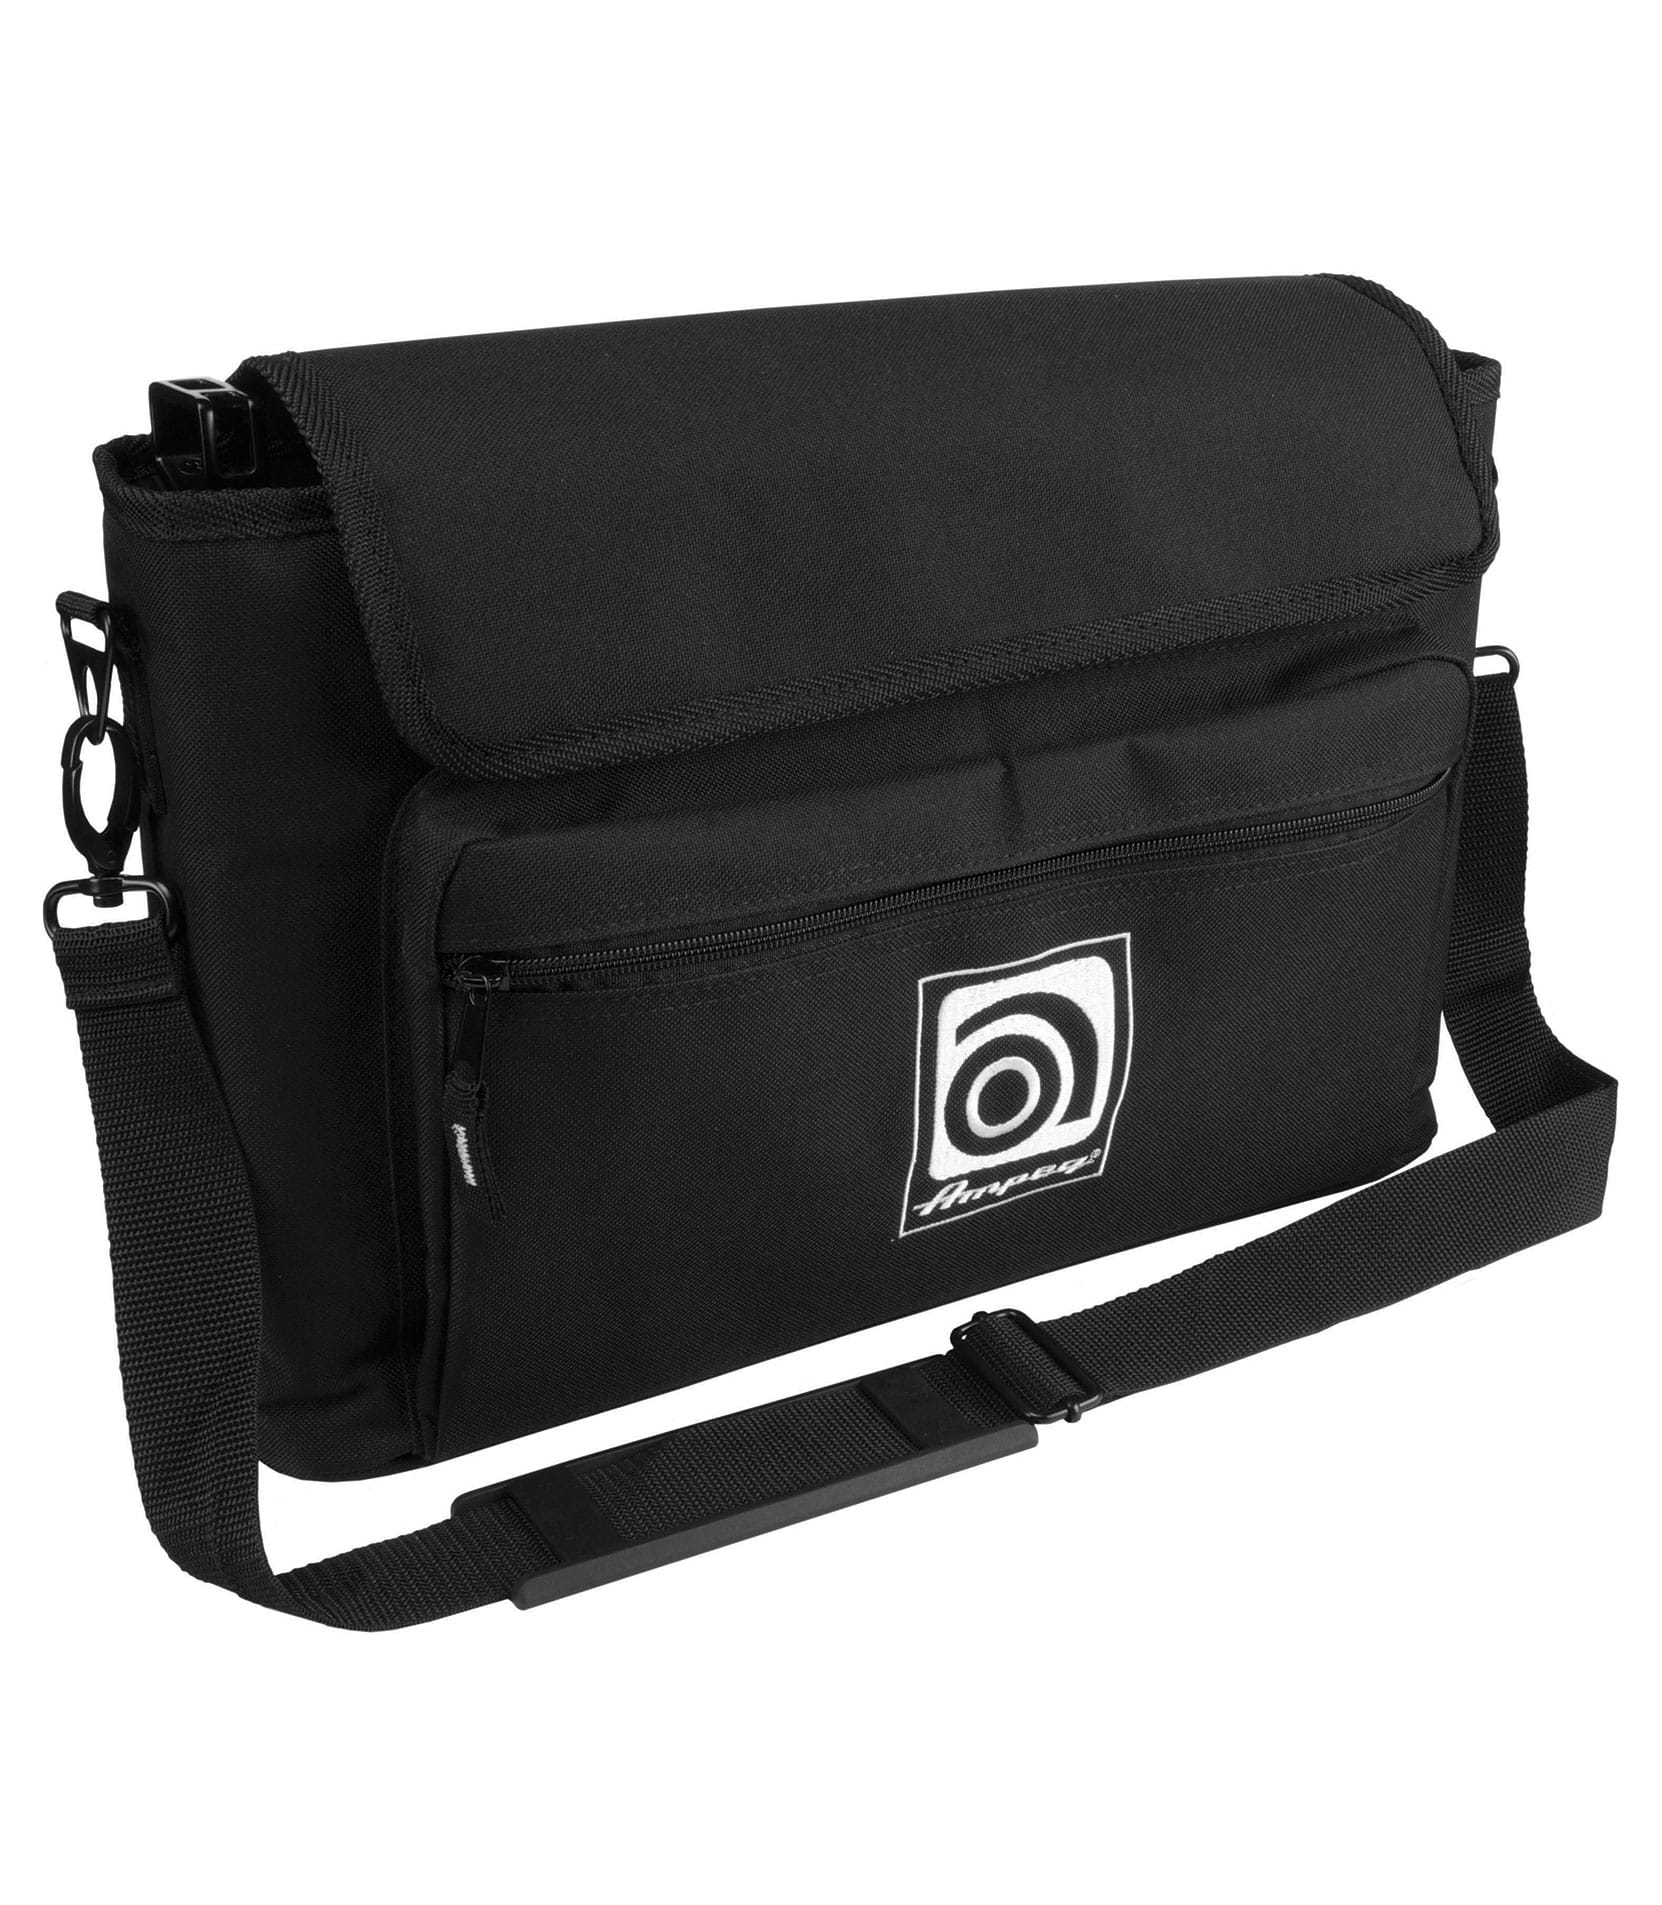 buy ampeg pf 500pf 800 bag